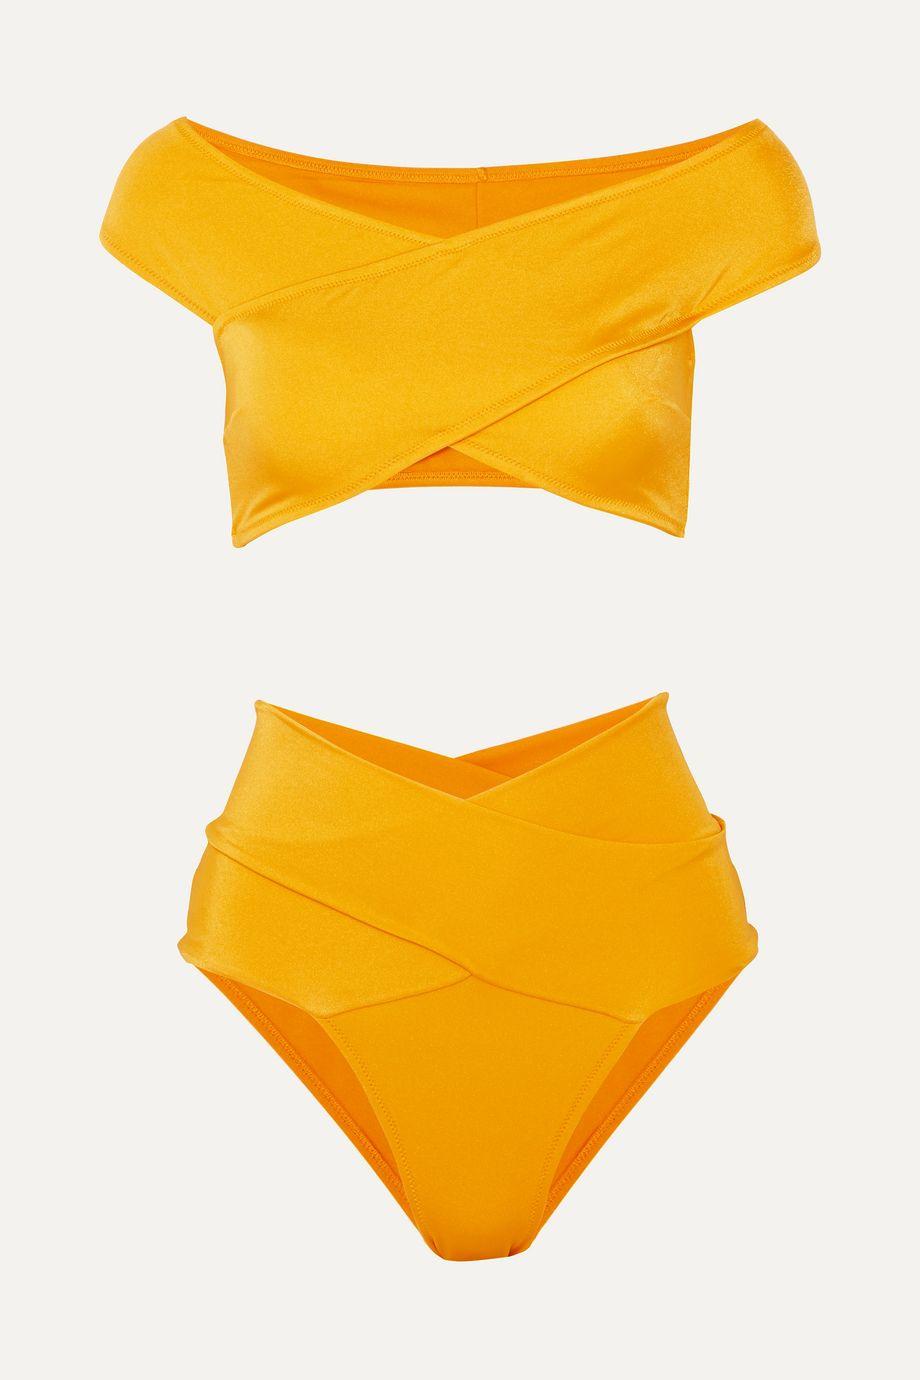 OYE Swimwear Lucette 围裹效果比基尼